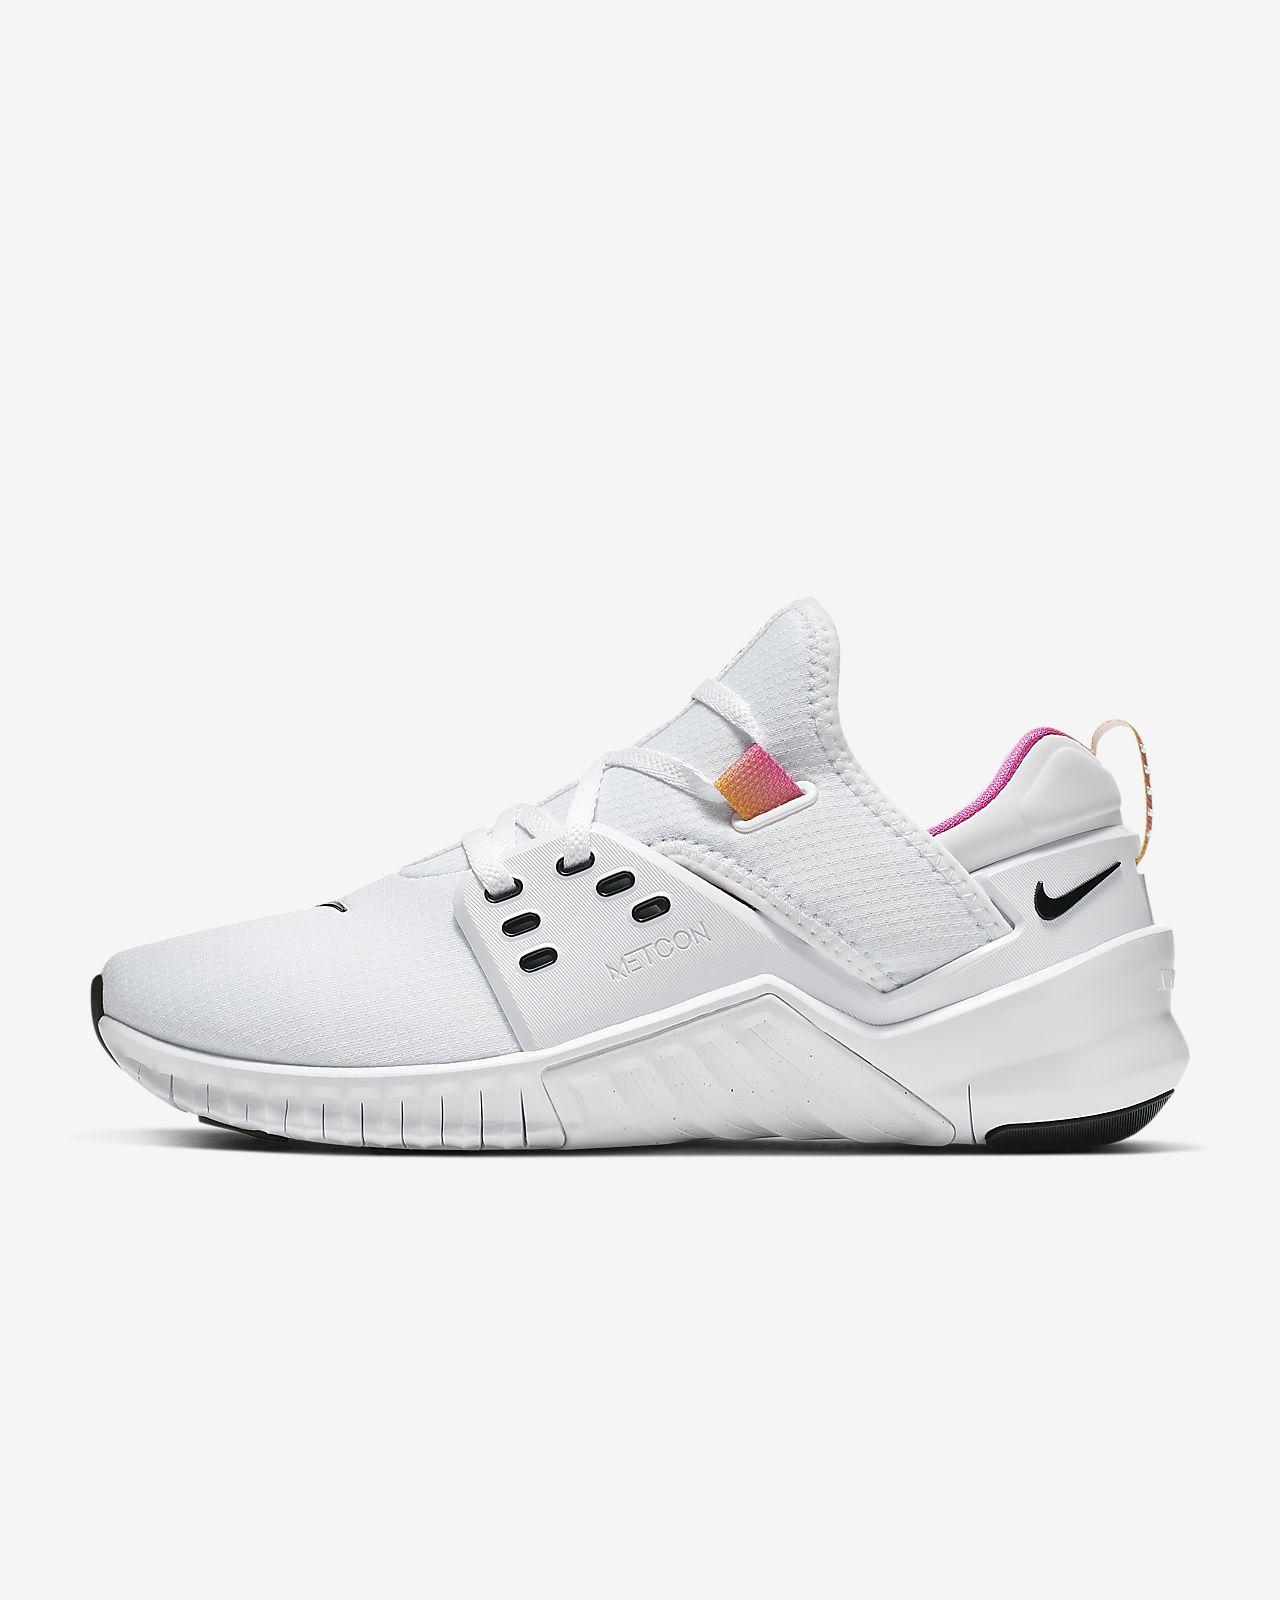 8d65ea775b8c5 Nike Free X Metcon 2 Women s Training Shoe. Nike.com AU